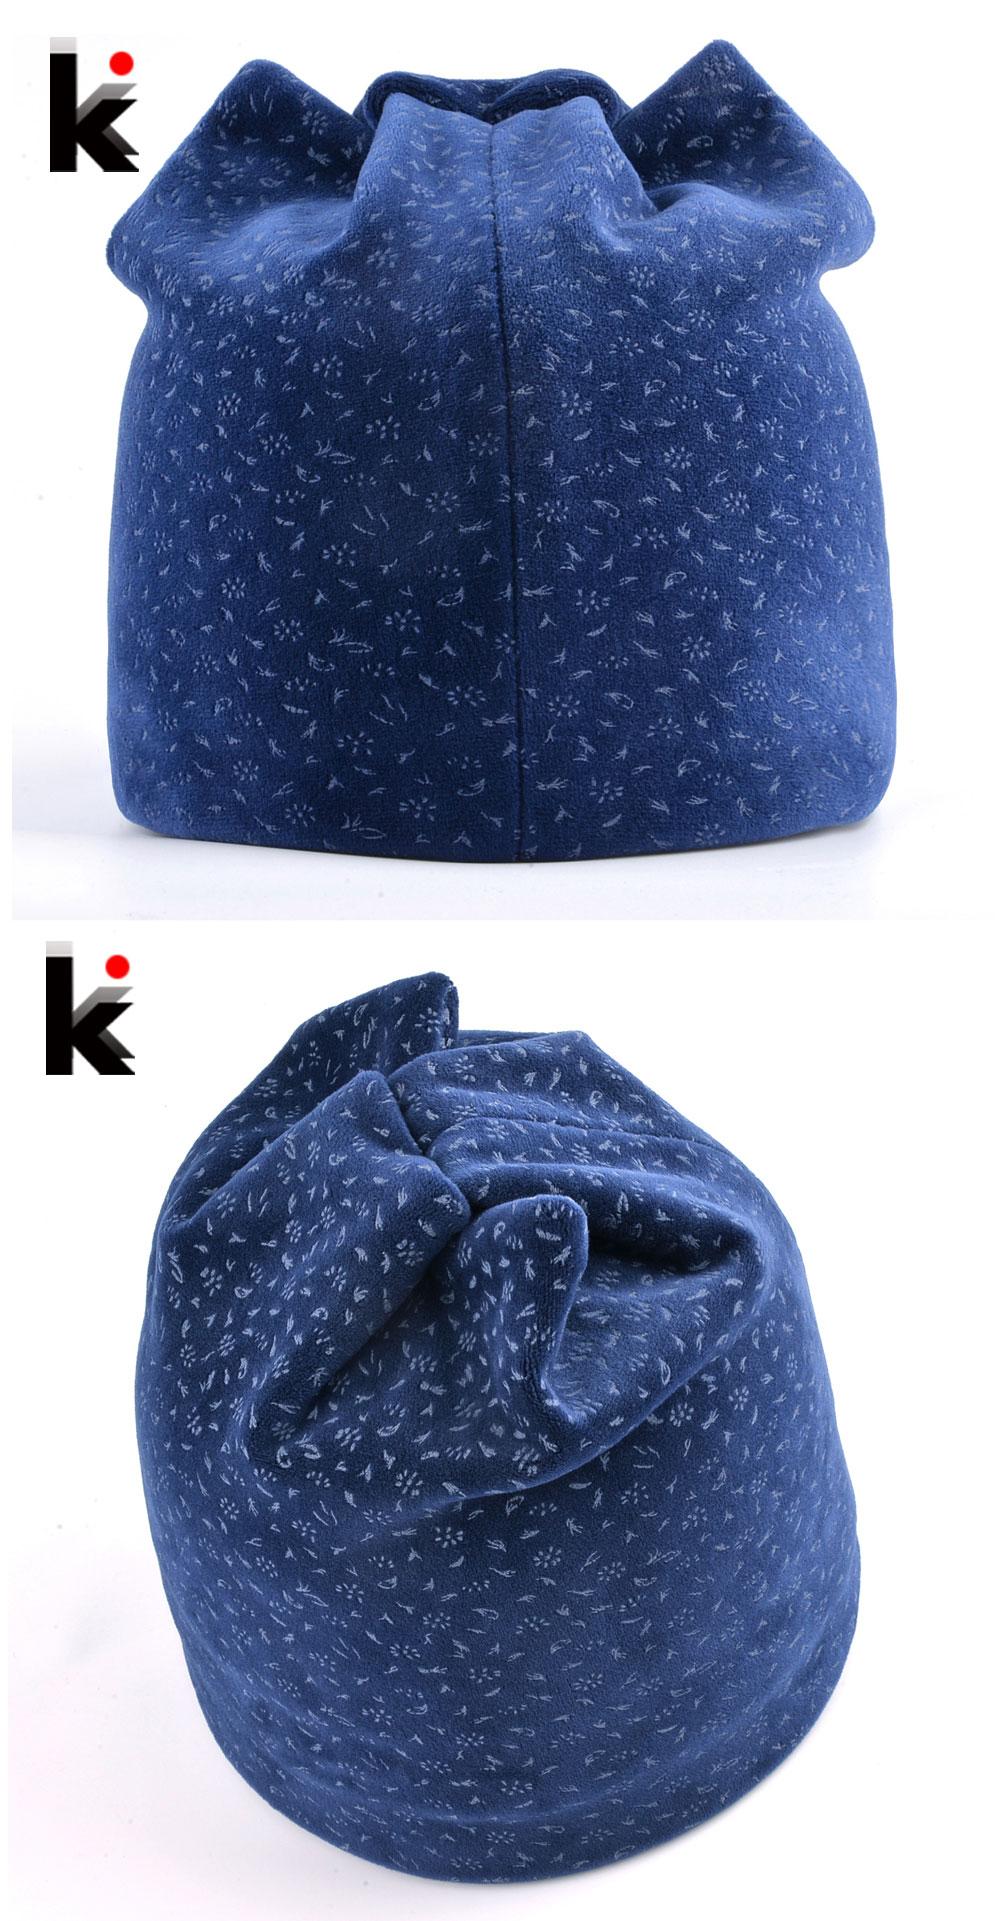 a80173a1bc9 Cat Ear Beanies Women Winter Warm Velvet Hat For Female Double Layer Thick Skullies  Beanie Cute Ear Flaps Cap Girls Soft Bonnet. K 01 K 02 ...